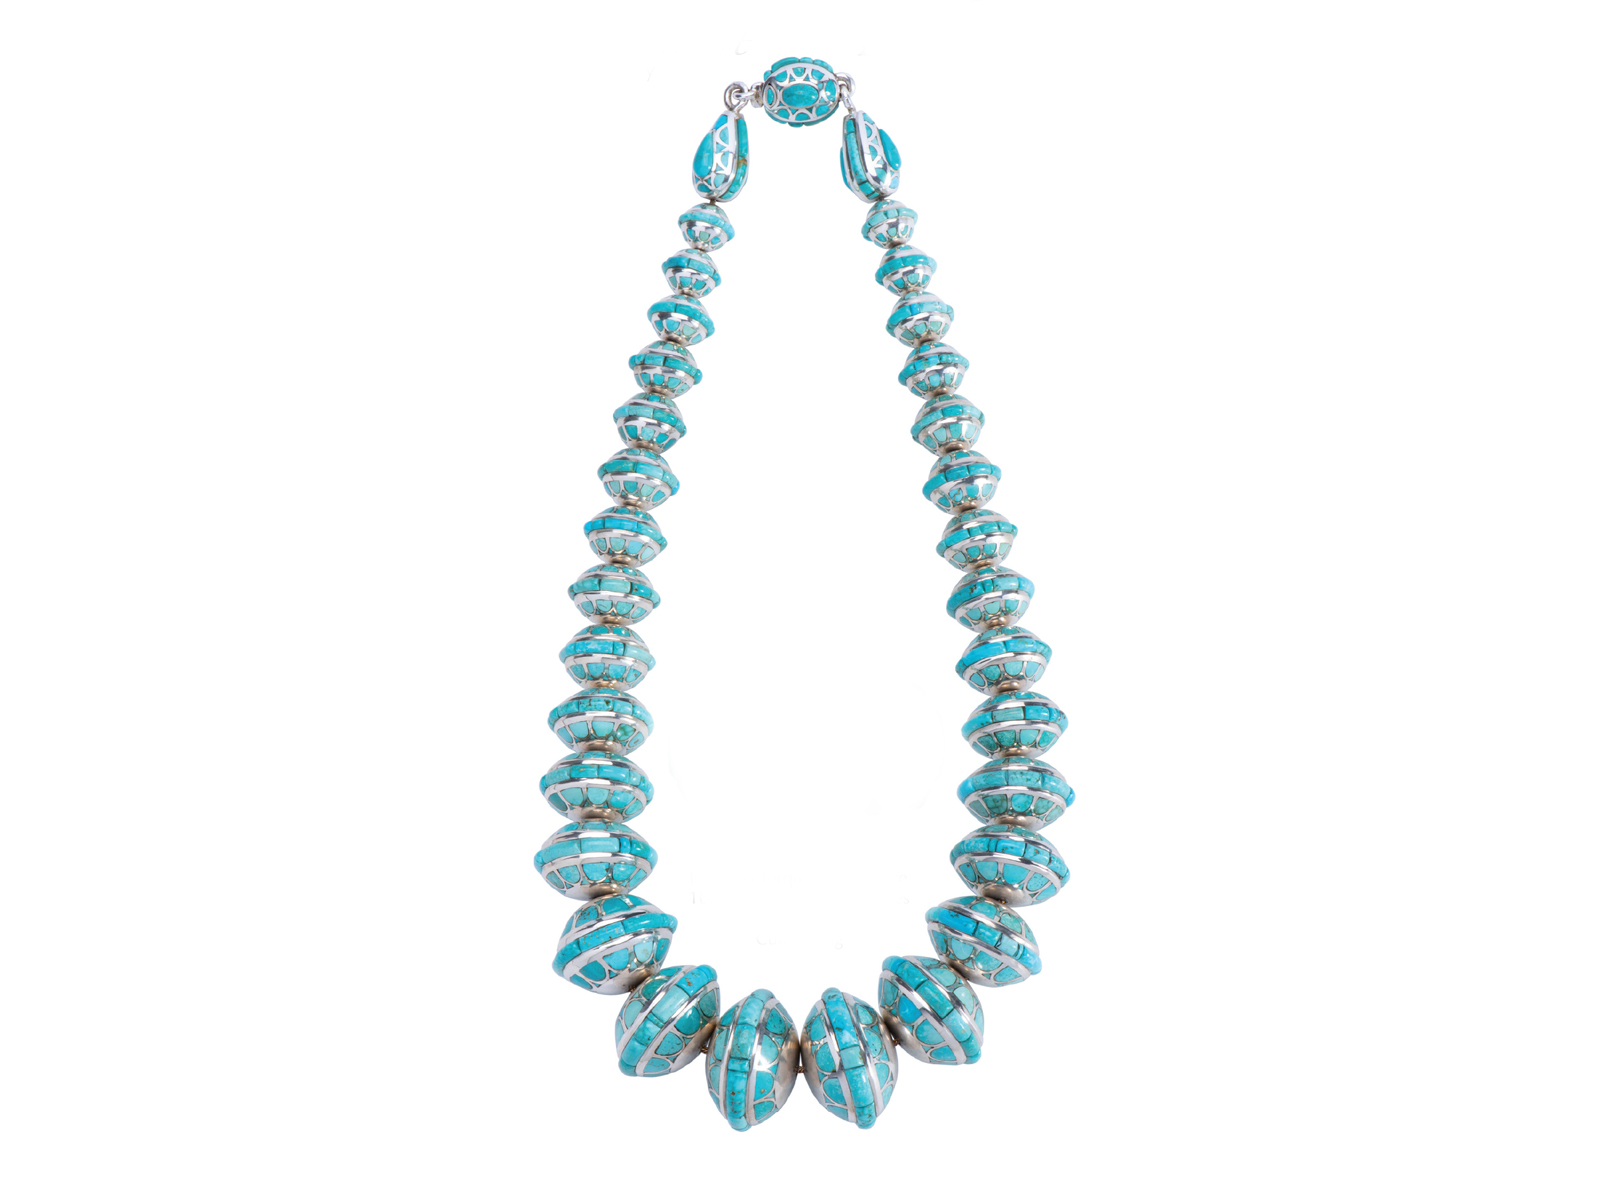 Argentium Silver Kingman Turquoise Necklace